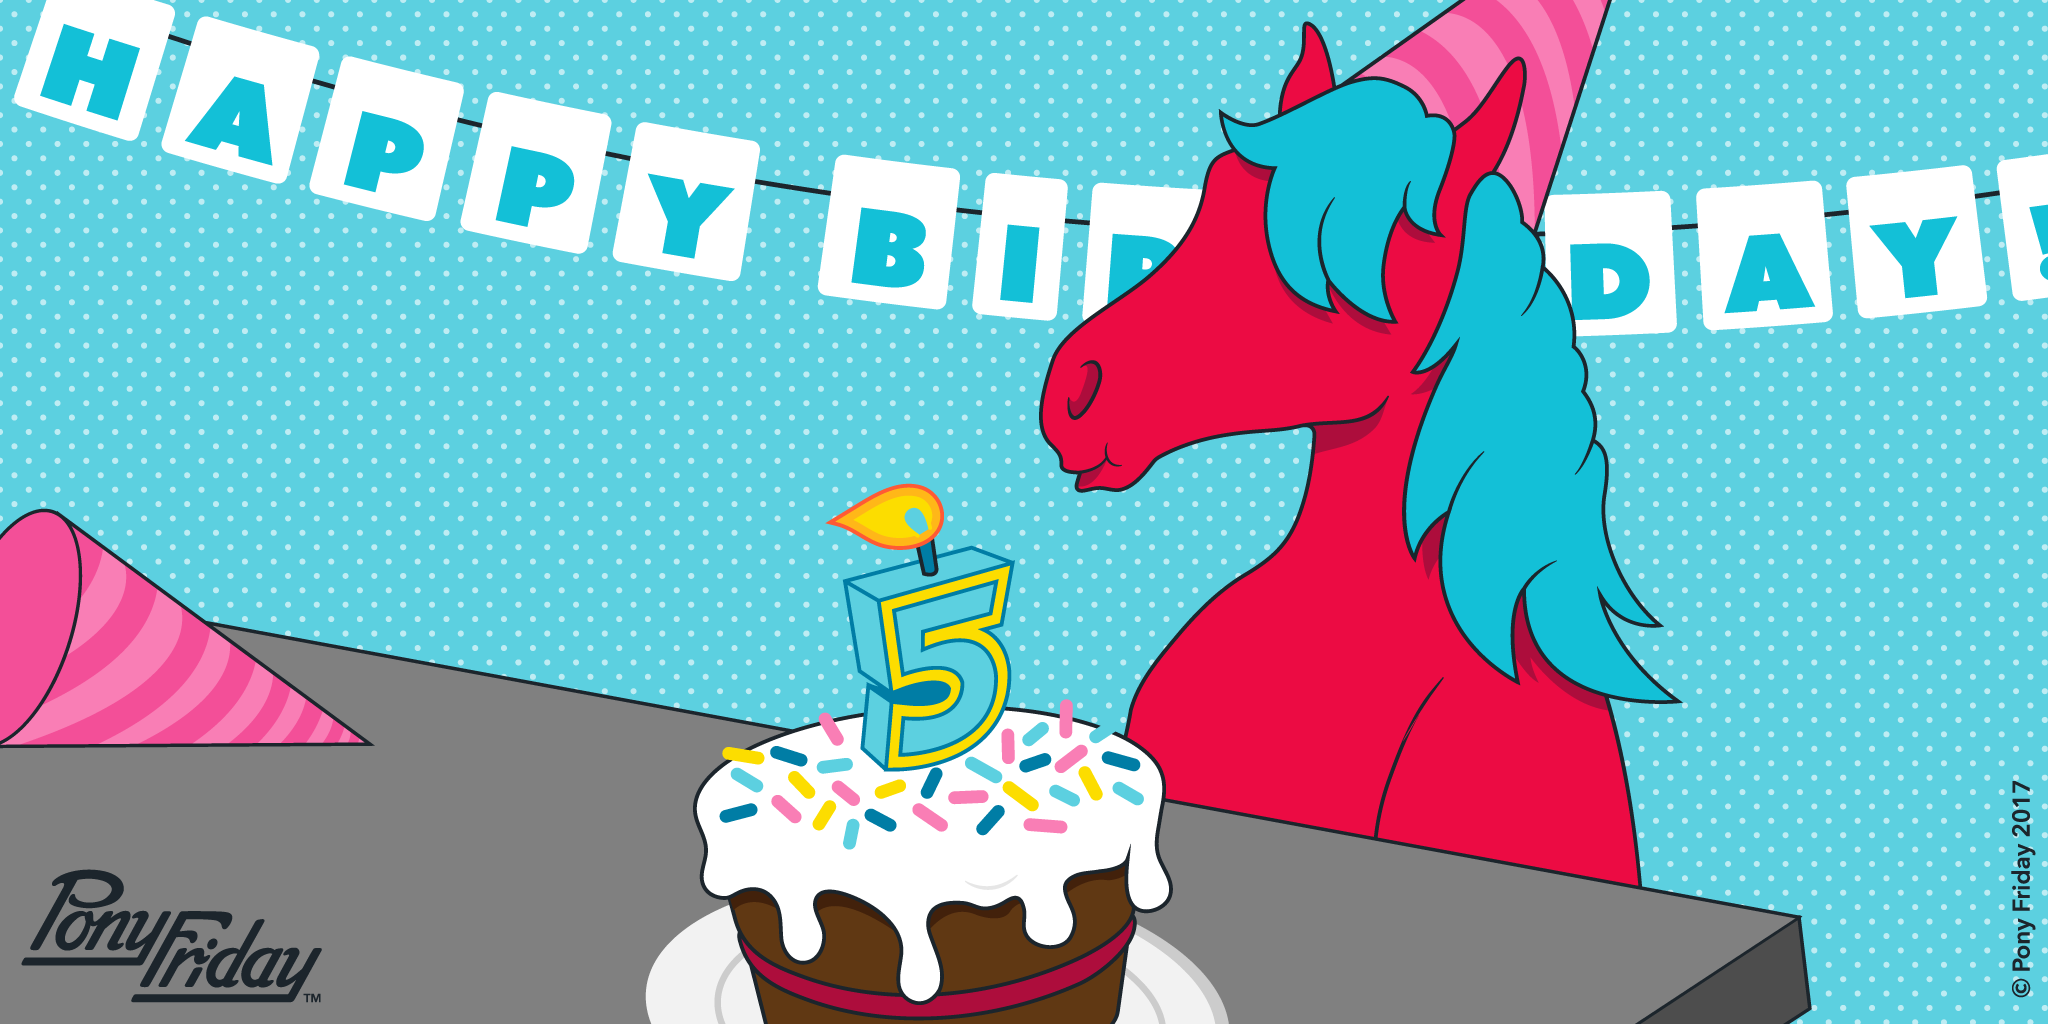 Pony-Friday-Birthday-Anniversary-Cake-Candle-Celebrate-Blog-Header-Image.png